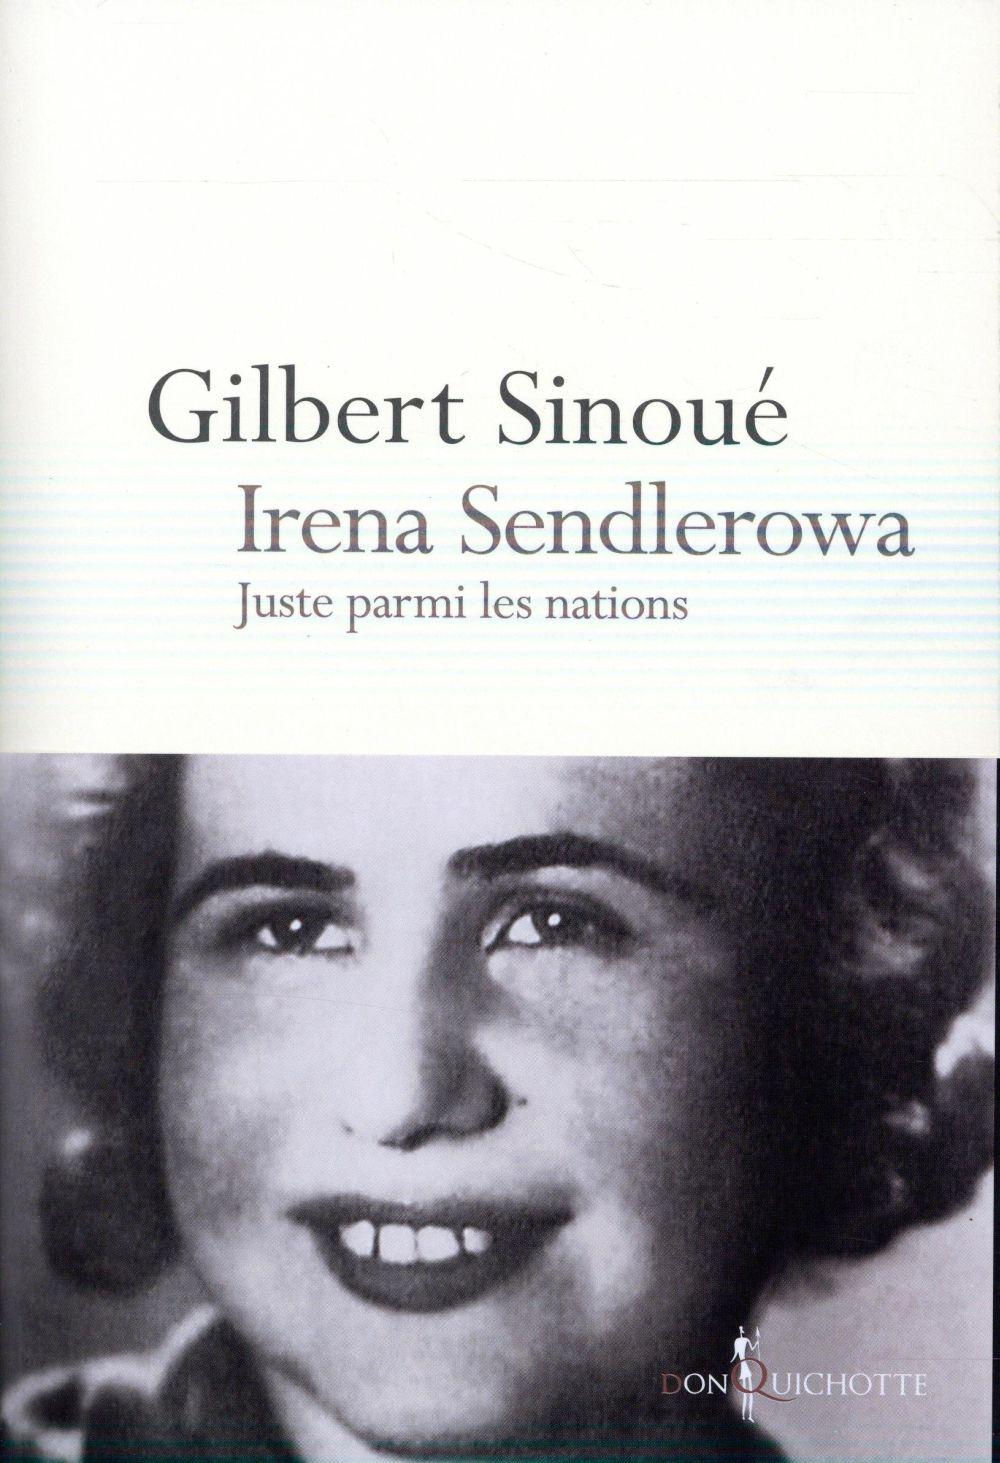 IRENA SENDLEROWA. JUSTE PARMI LES NATIONS